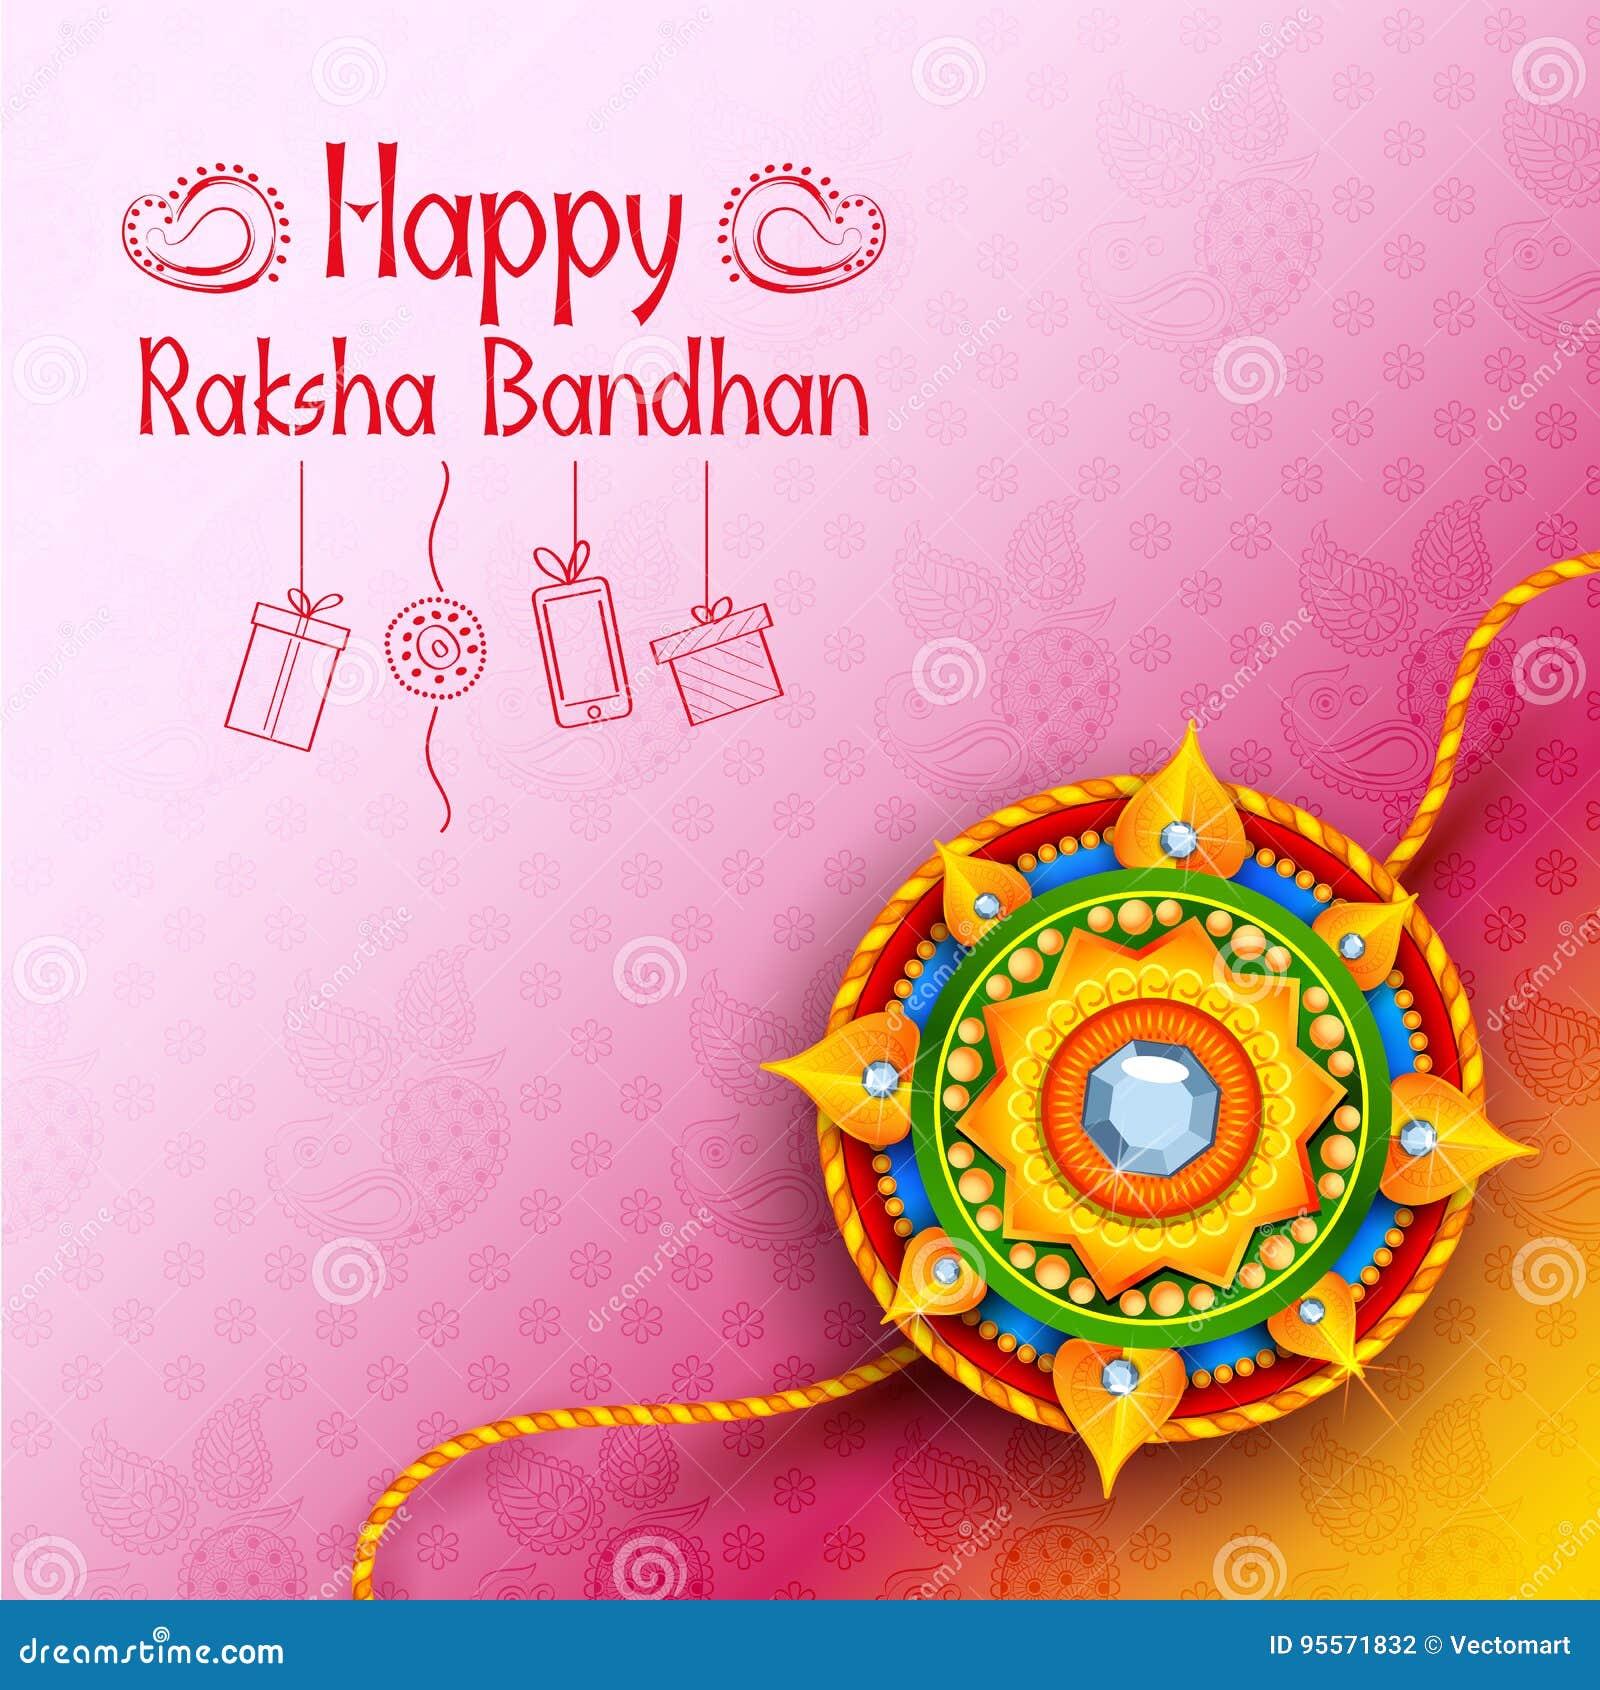 Rakhi Festival Quotes Brother: Greeting Card With Decorative Rakhi For Raksha Bandhan